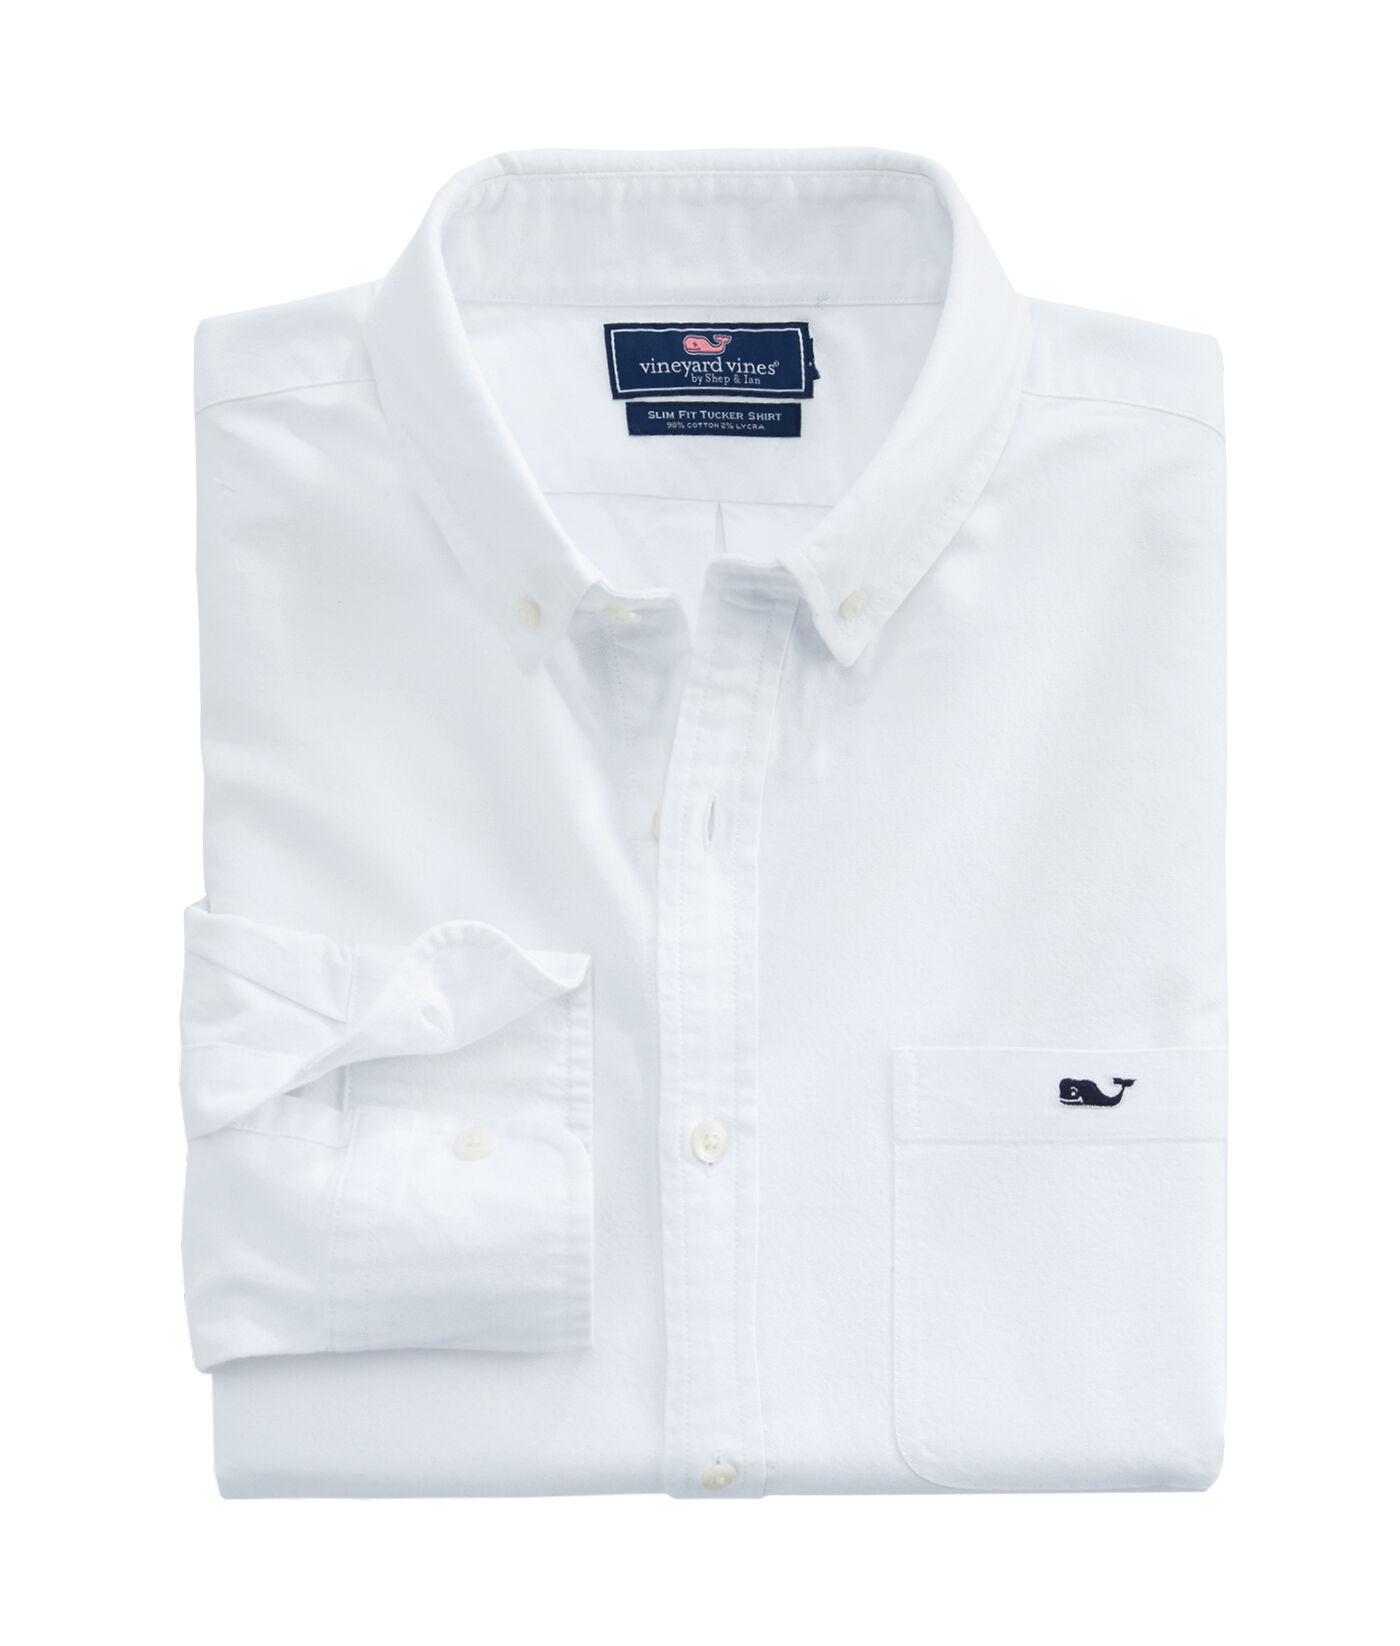 Solid White, X-Large Vineyard Vines Slim Fit Whale Shirt